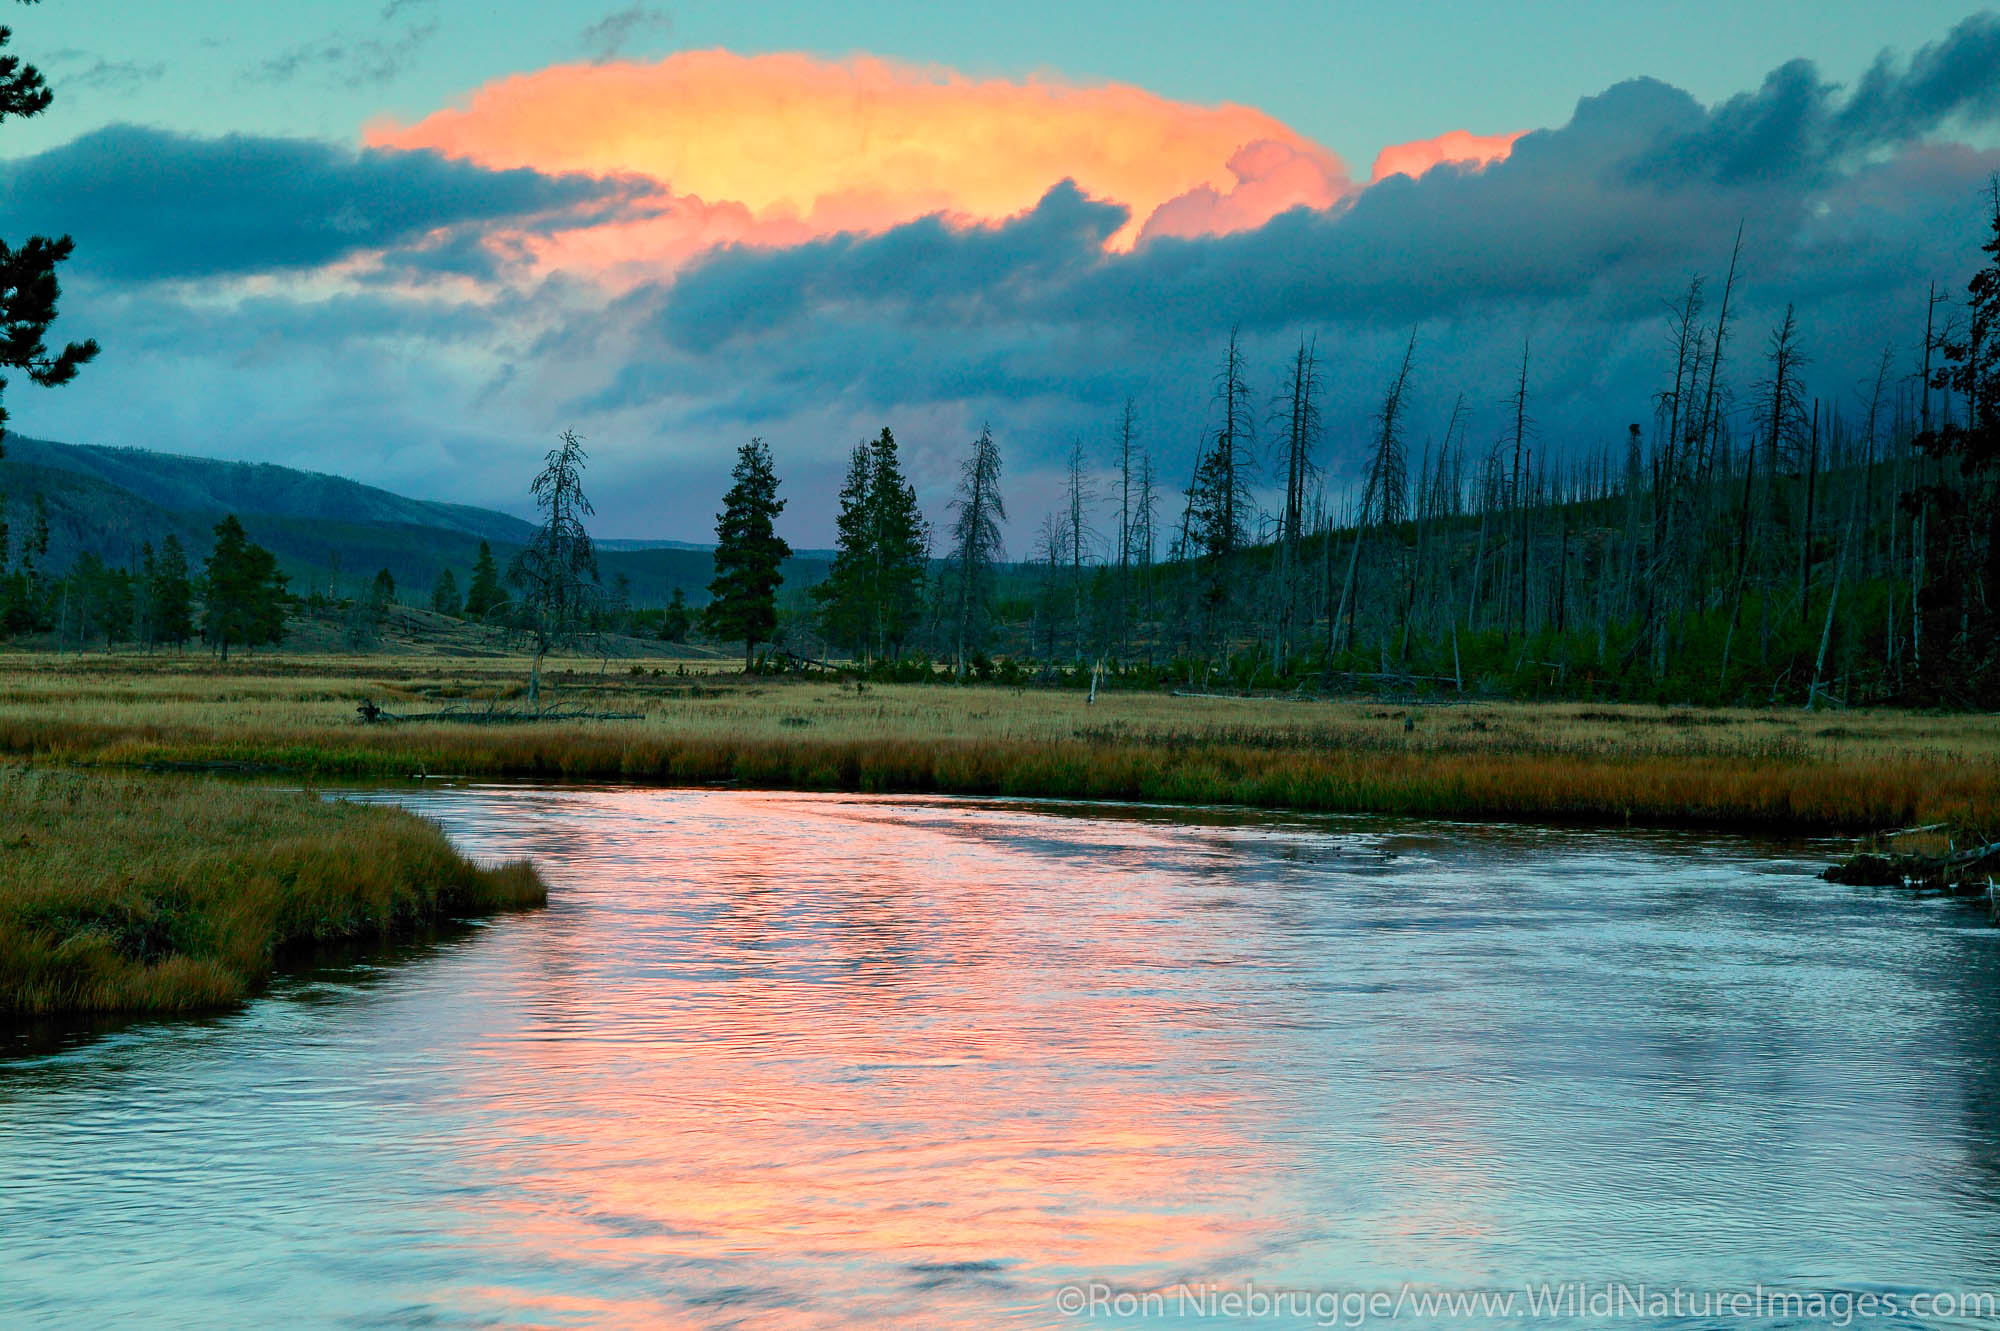 Sunset on the Gibbon River near Madison, Yellowstone National Park, Wyoming.